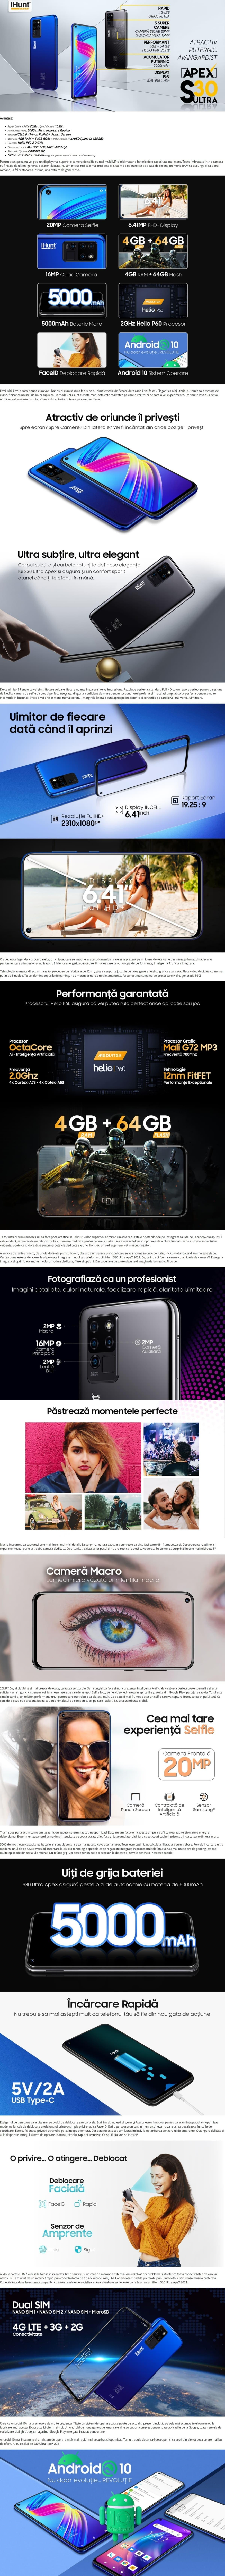 iHunt-S30-Ultra-ApeX-2021fd5e754ae243cb3f.jpg